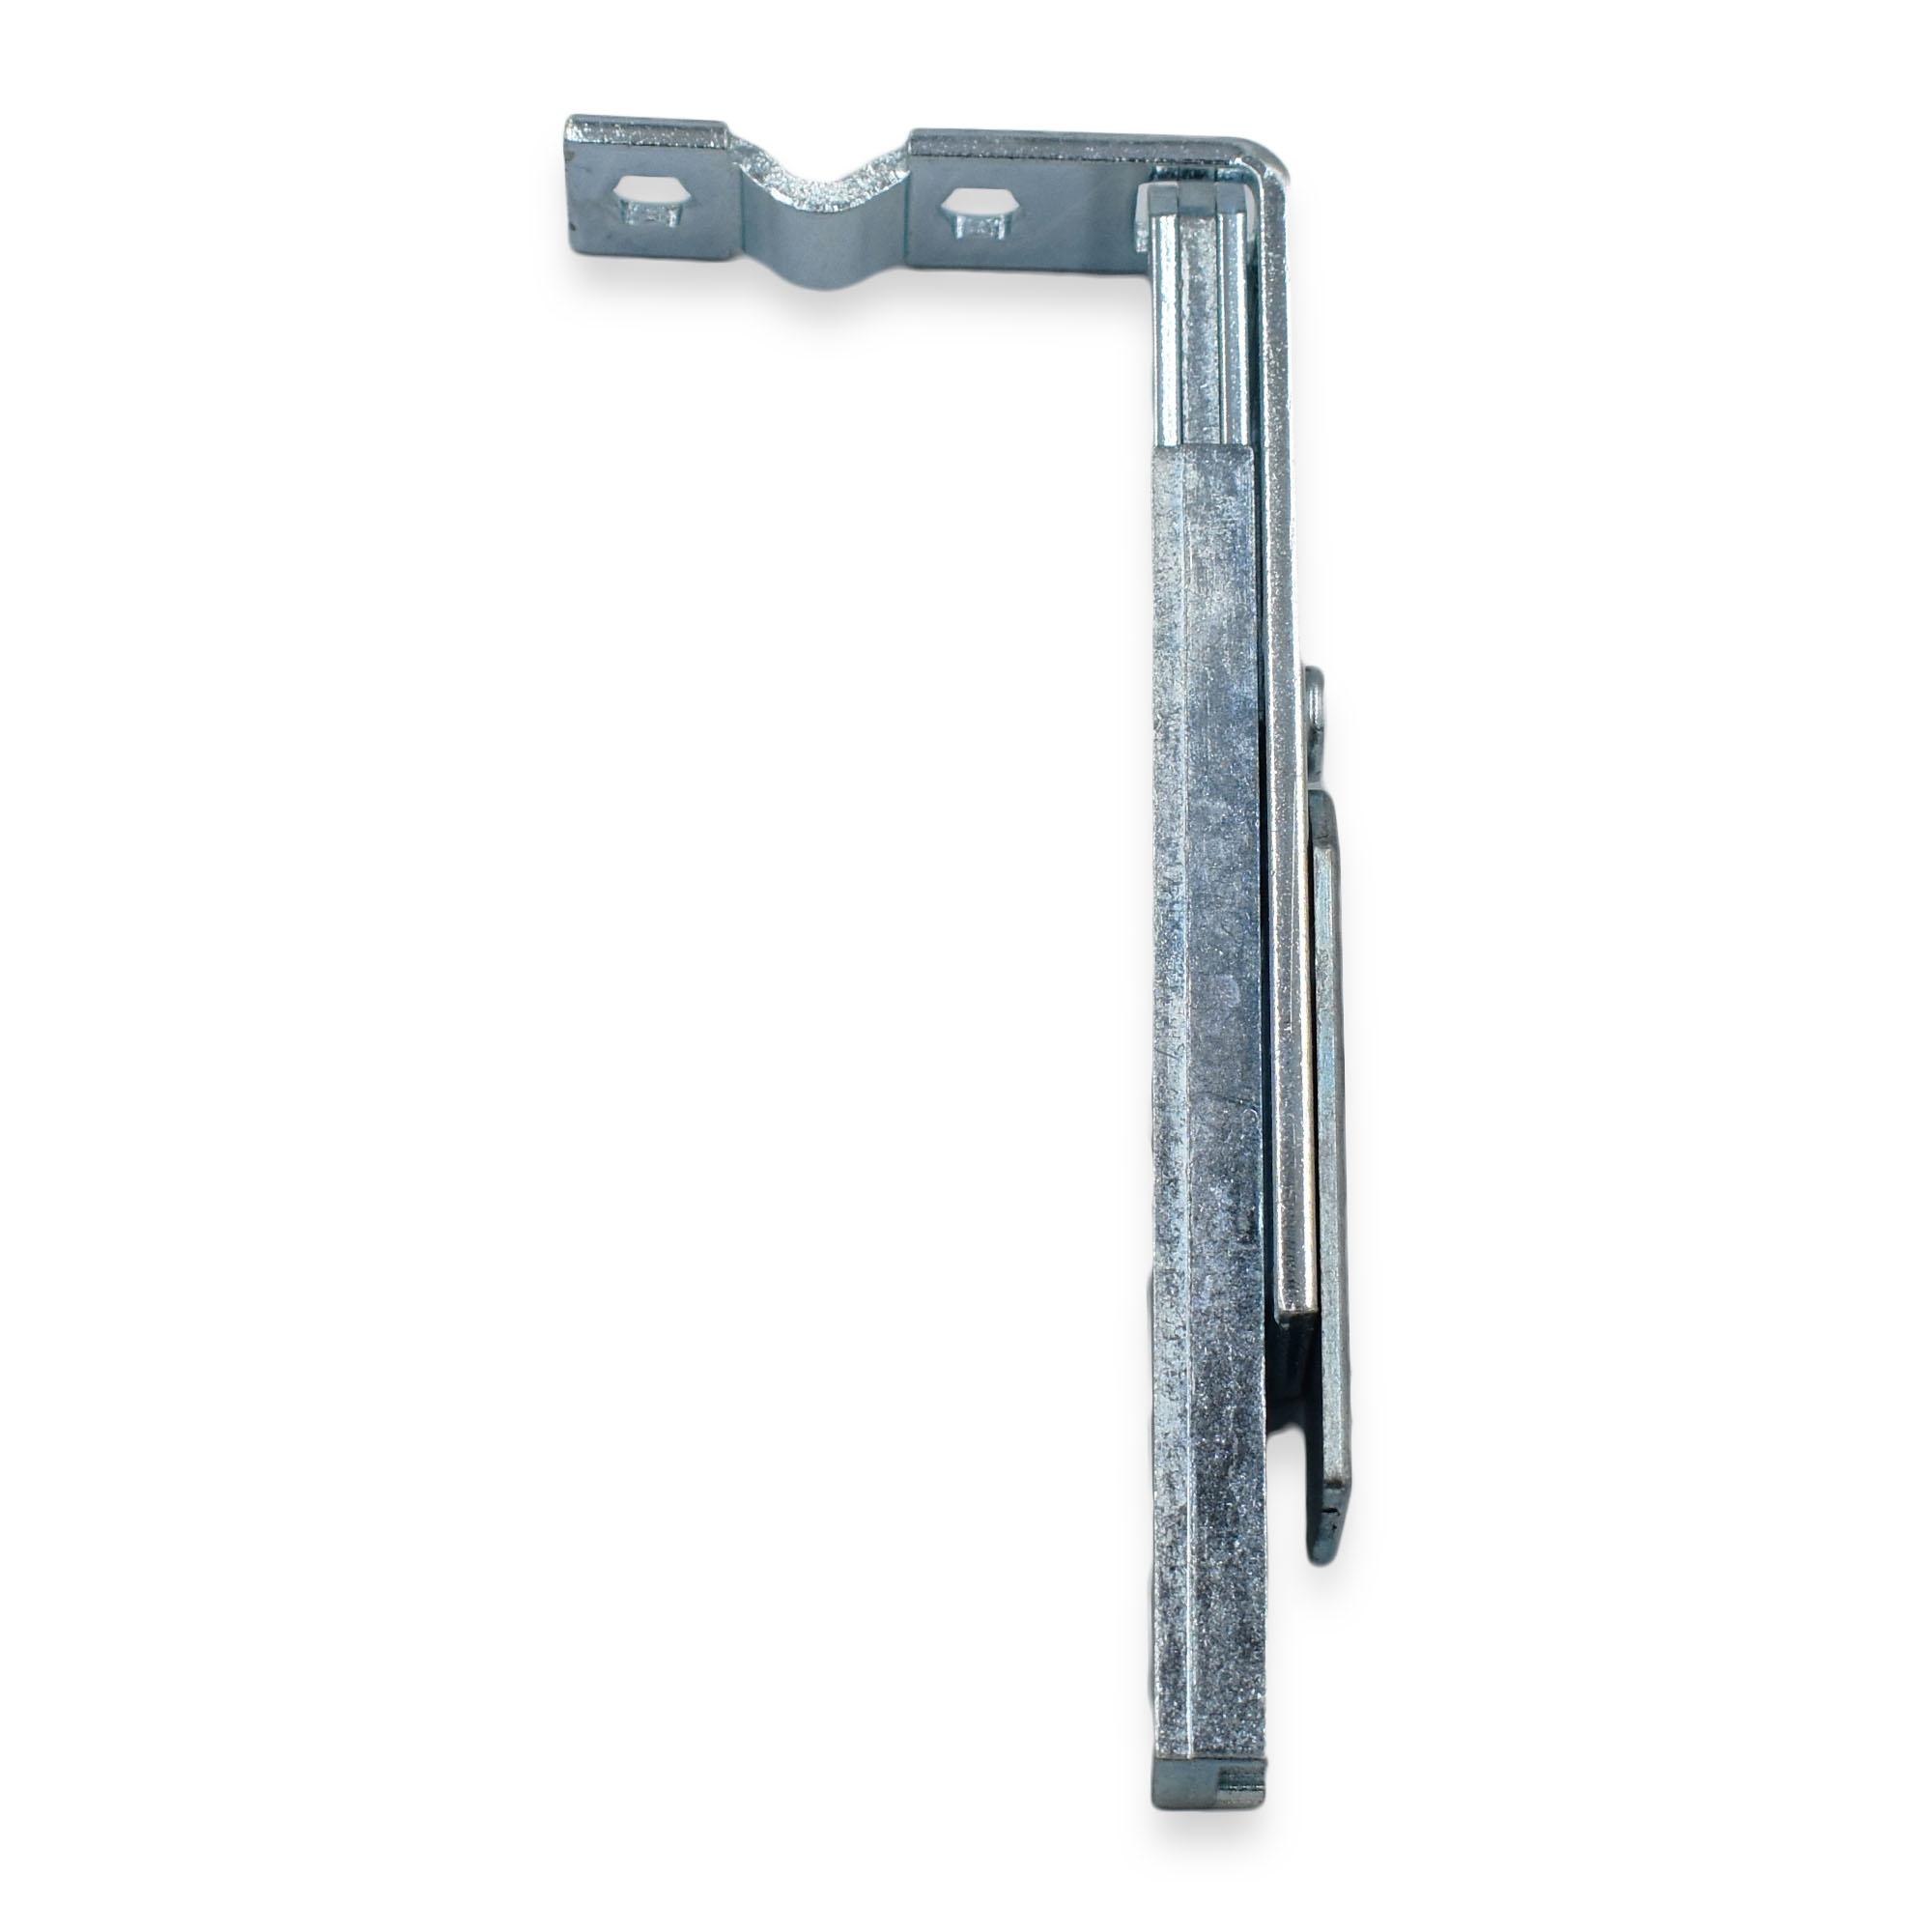 Pair of Yale Paddock Lockmaster Shootbolt Extension UPVC Door French Doors Set